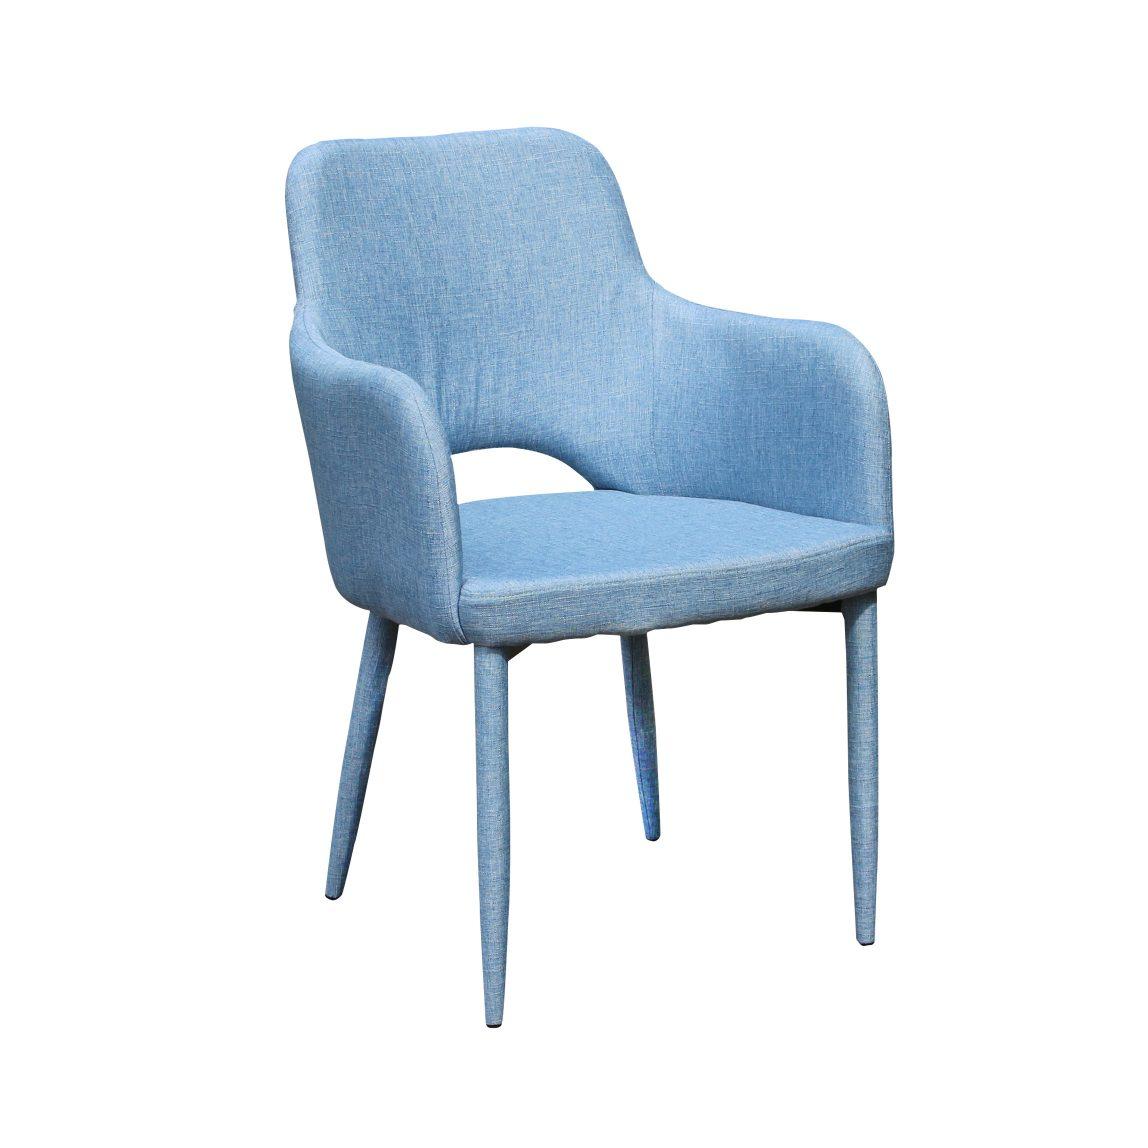 Дизайнерский голубой стул Мирон